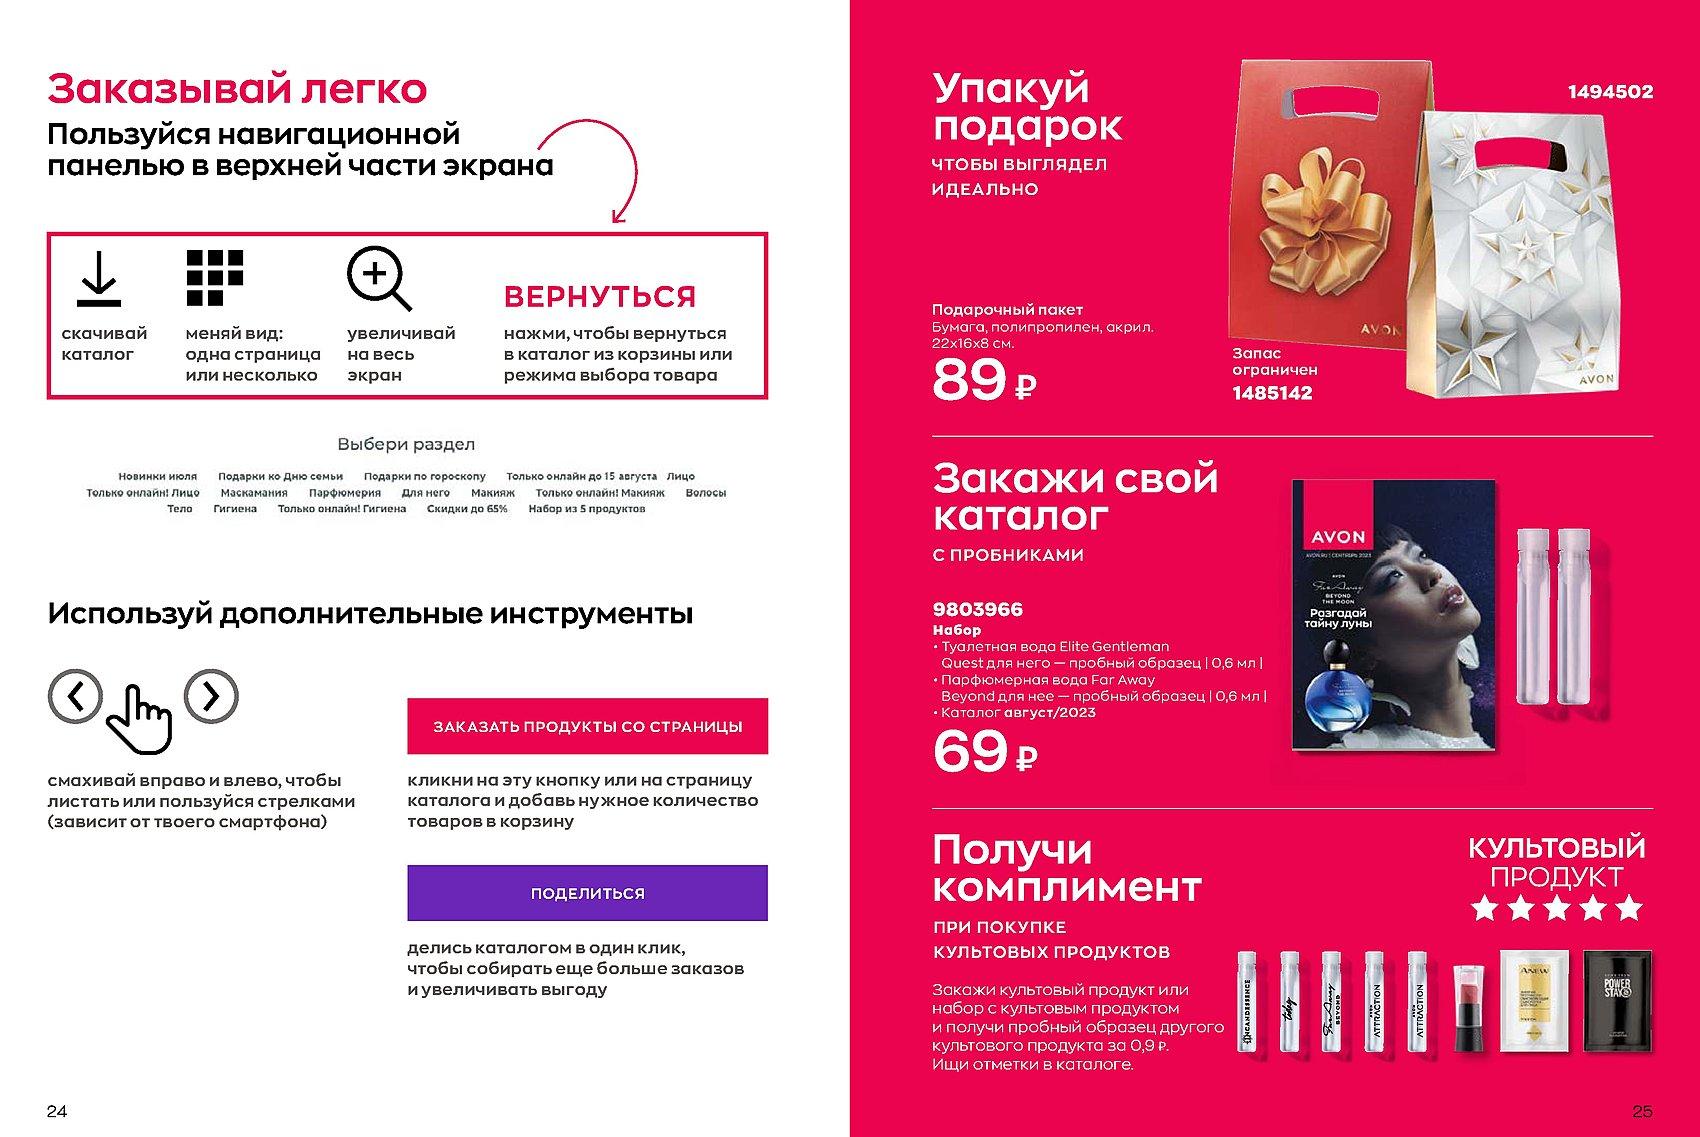 Страницы 24 - 25 каталог